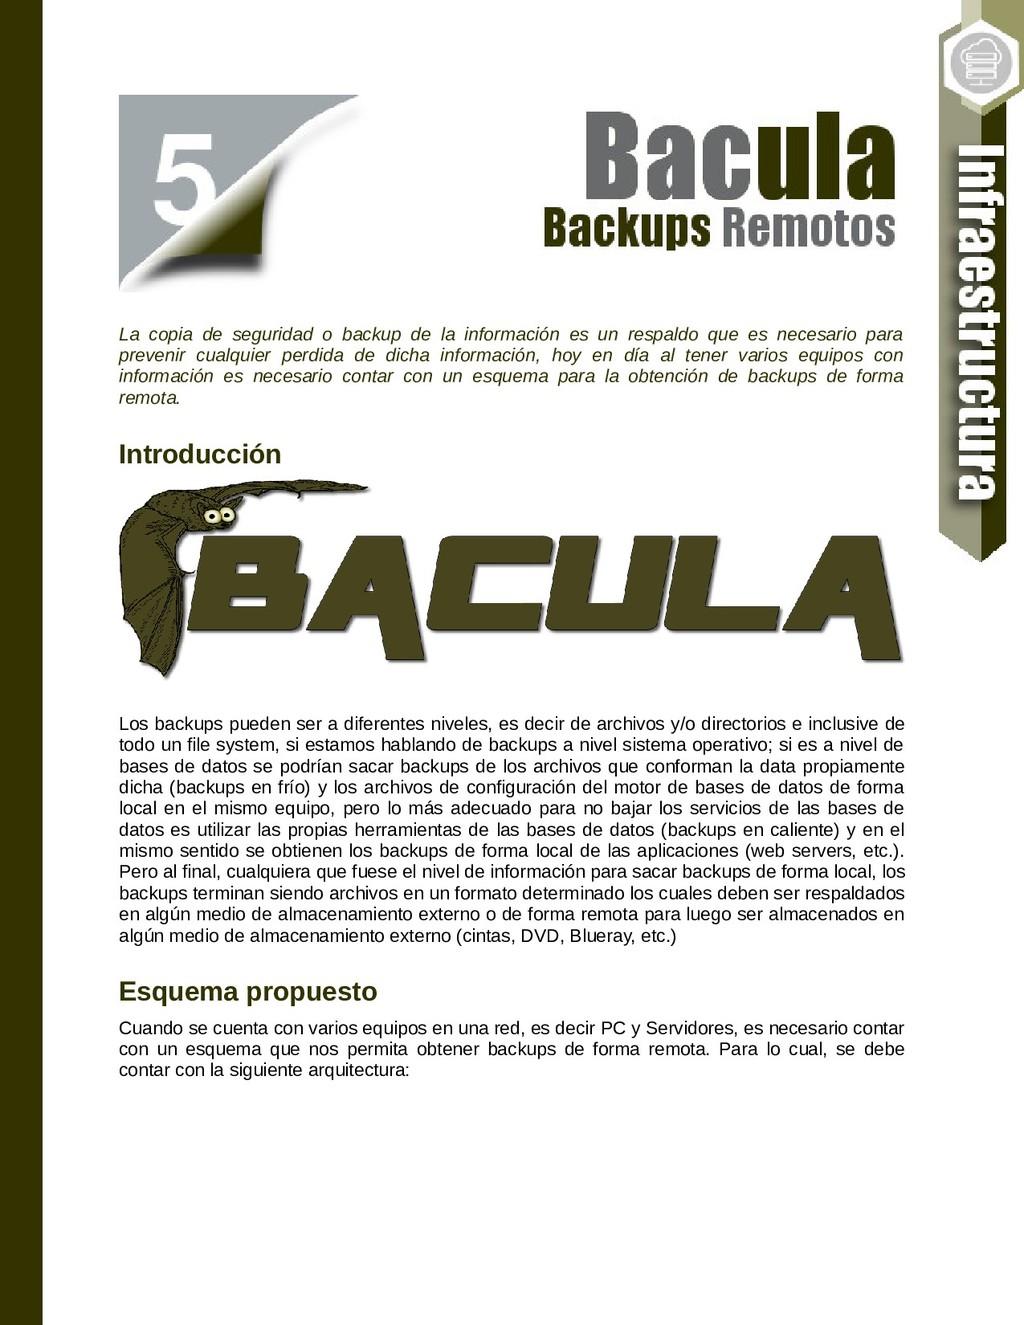 La copia de seguridad o backup de la informació...